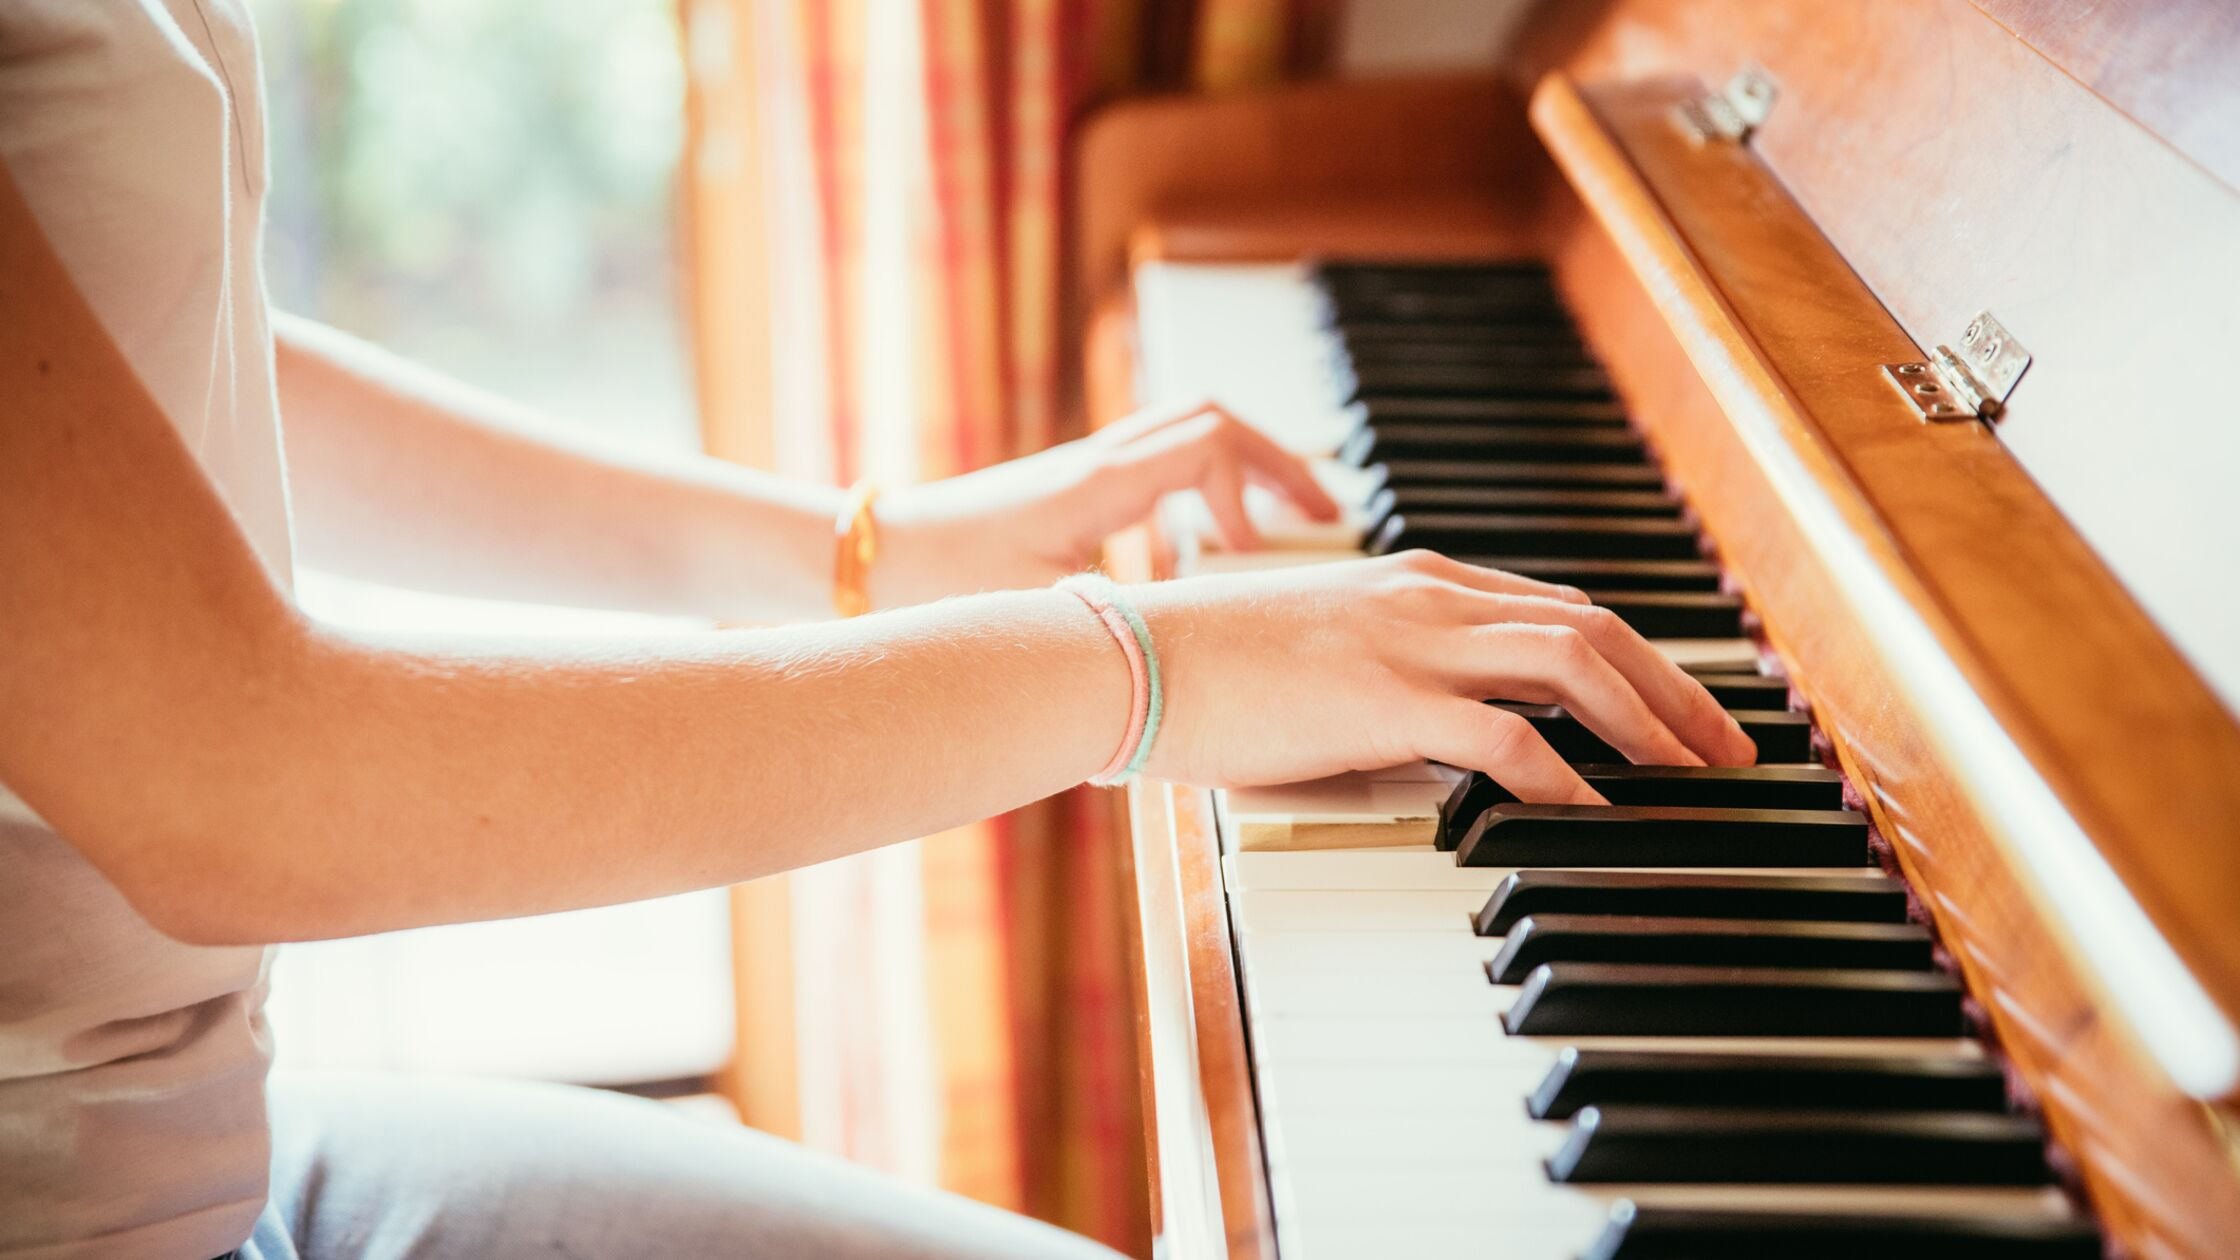 Junge Frau spielt Klavier